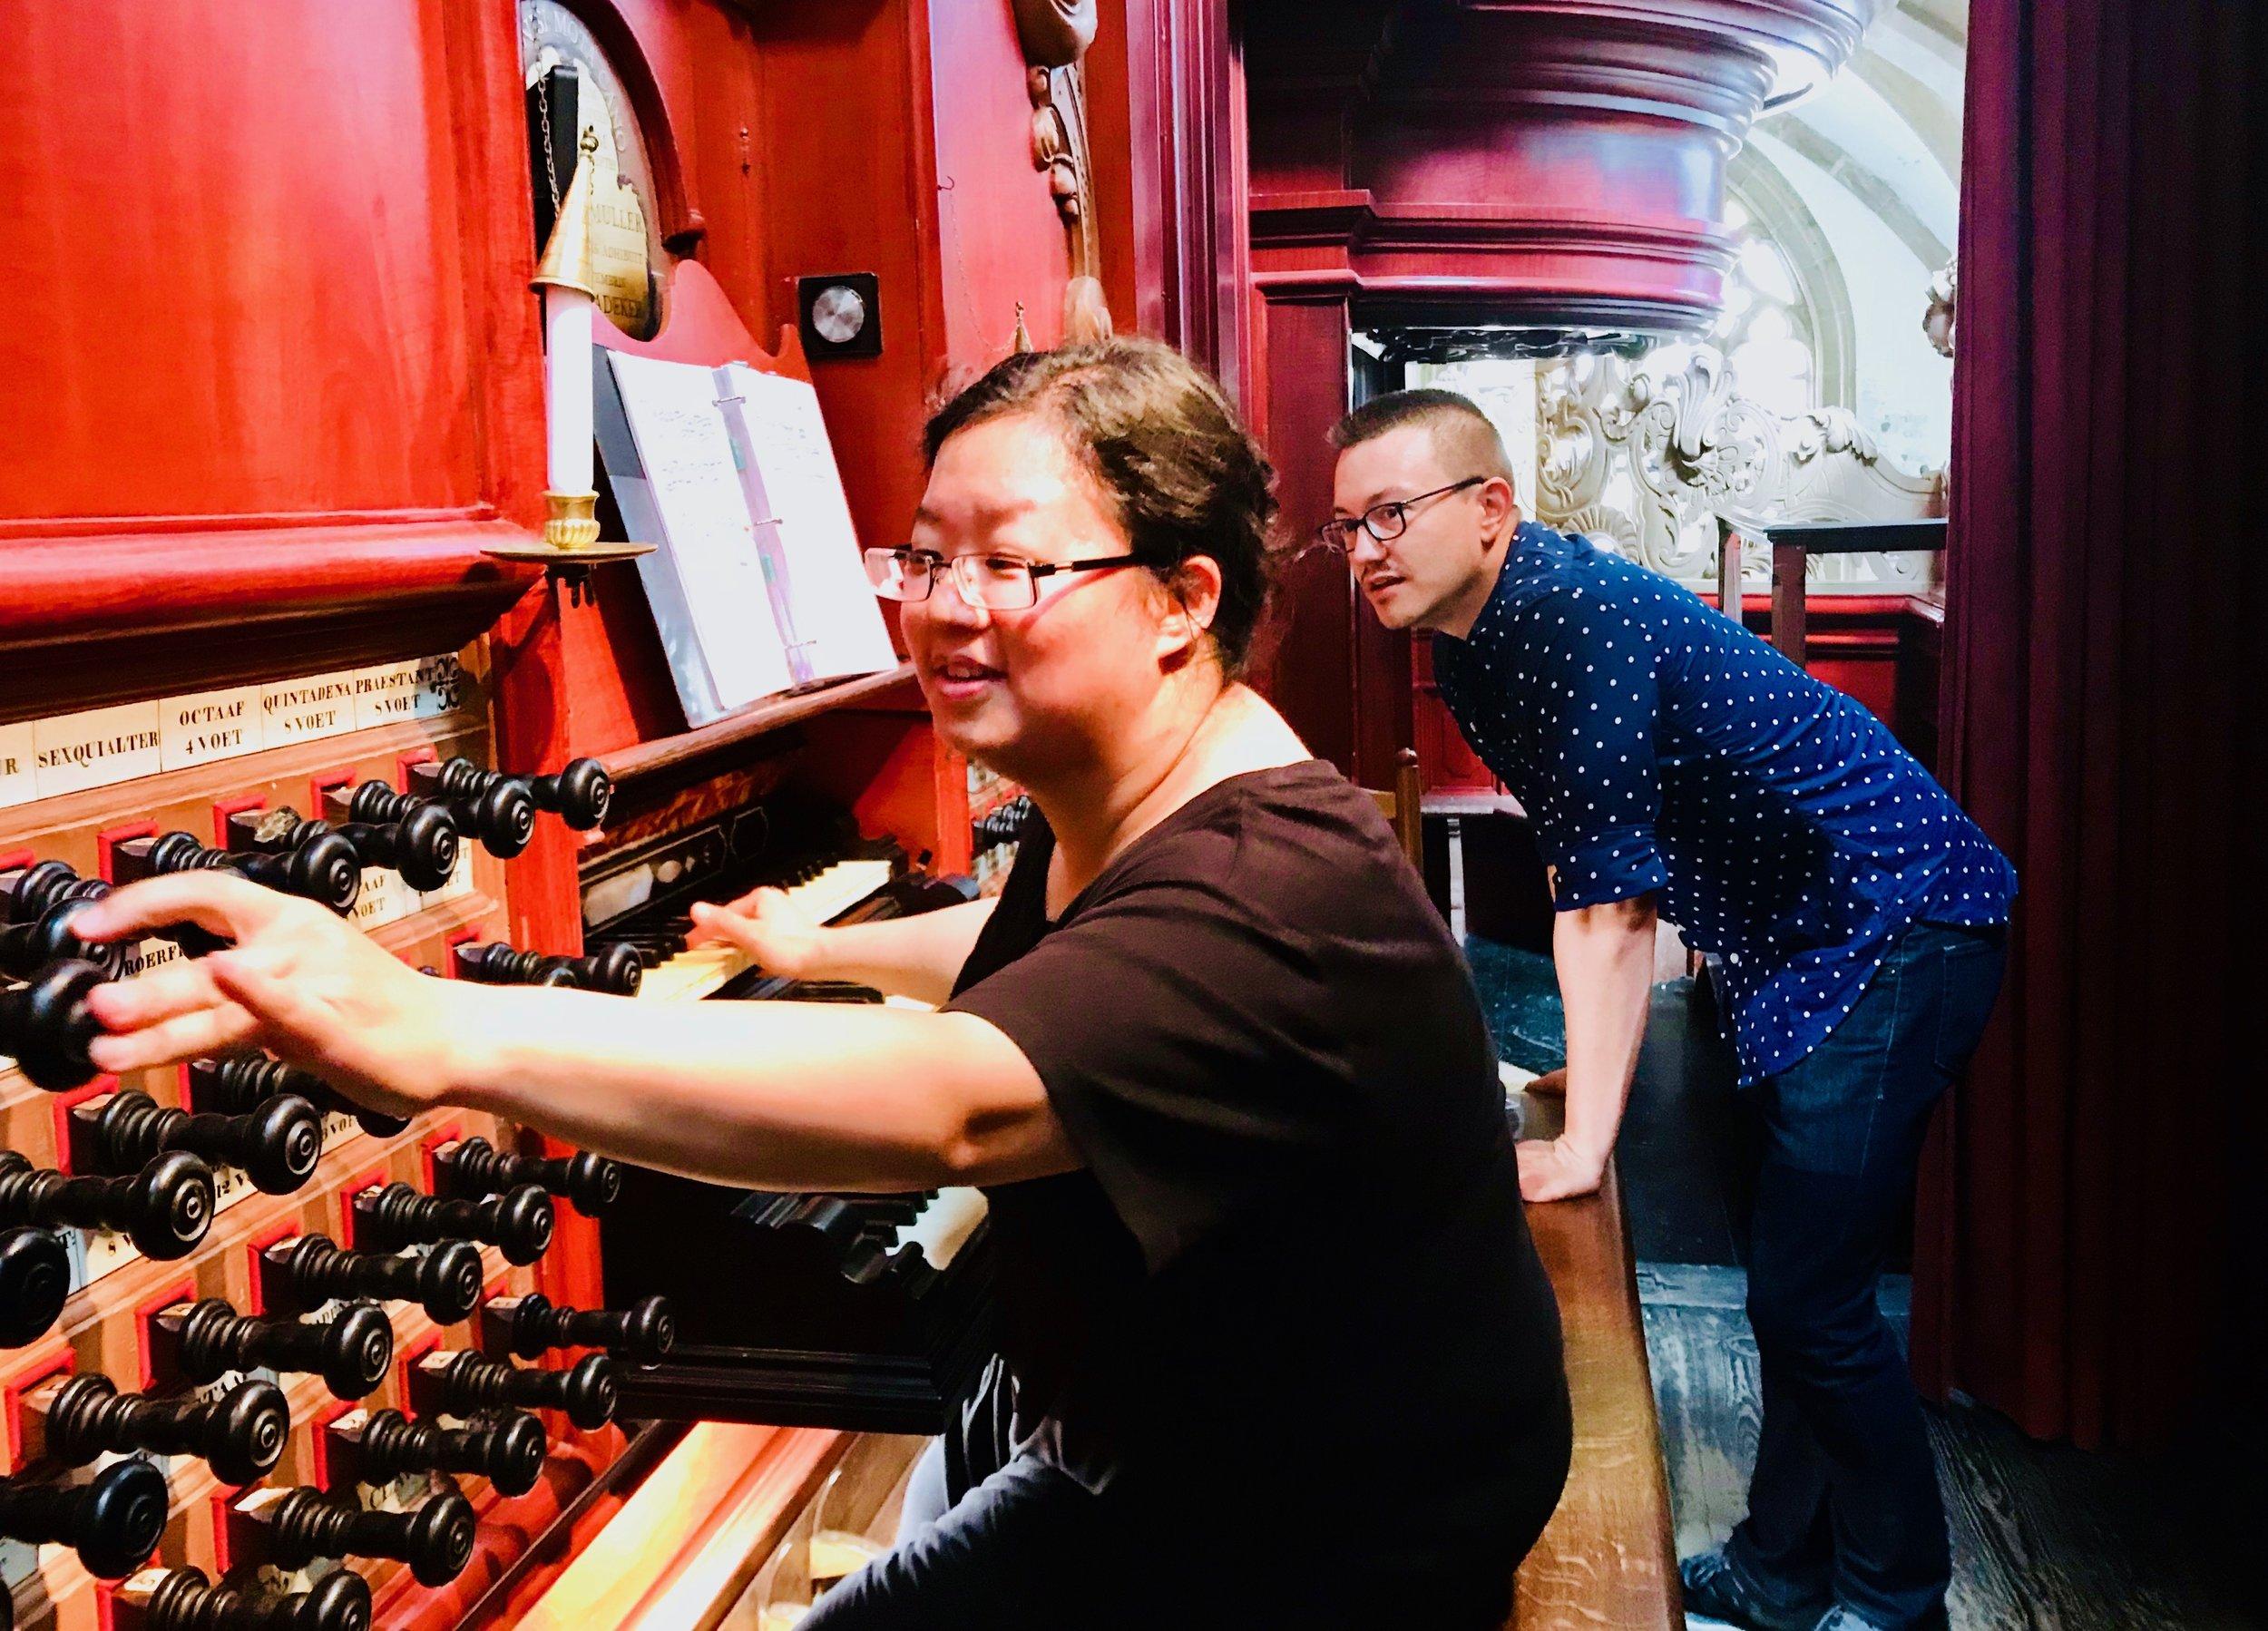 Corey De Tar assists Jennifer Hsiao at the Muller organ in St-Bavo, Haarlem.